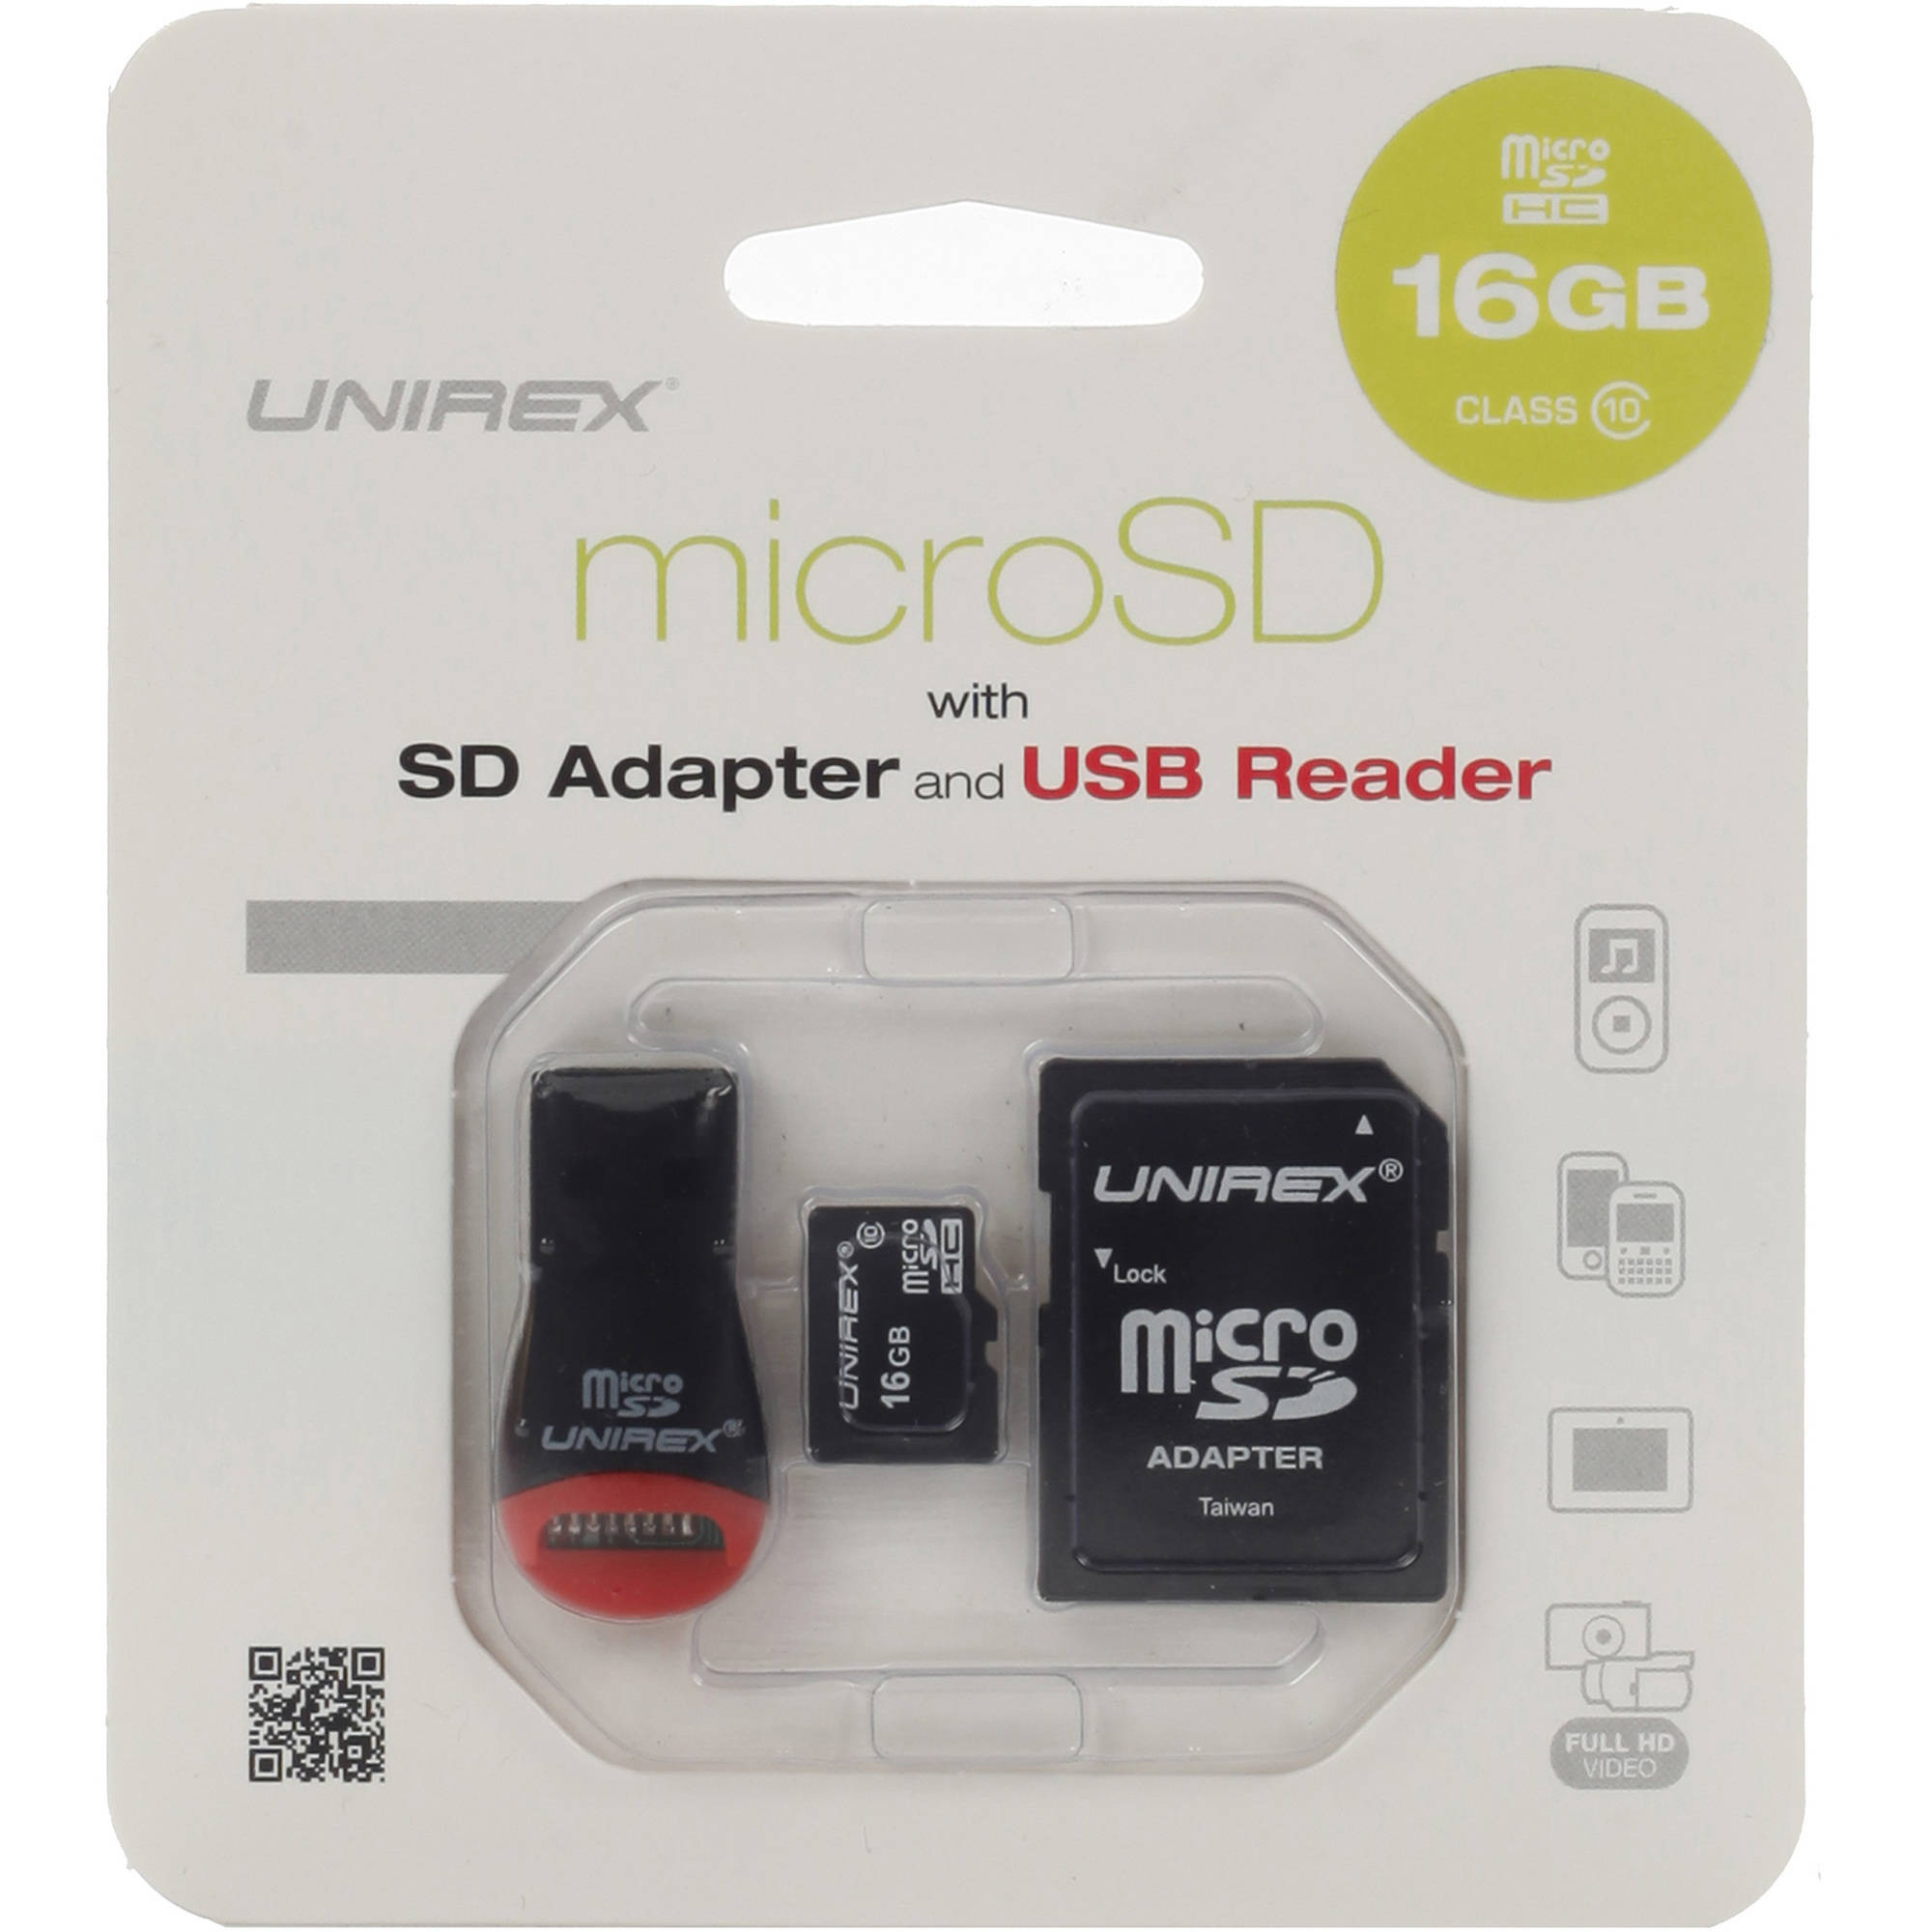 Unirex microSD 16GB Class 10 with USB Reader